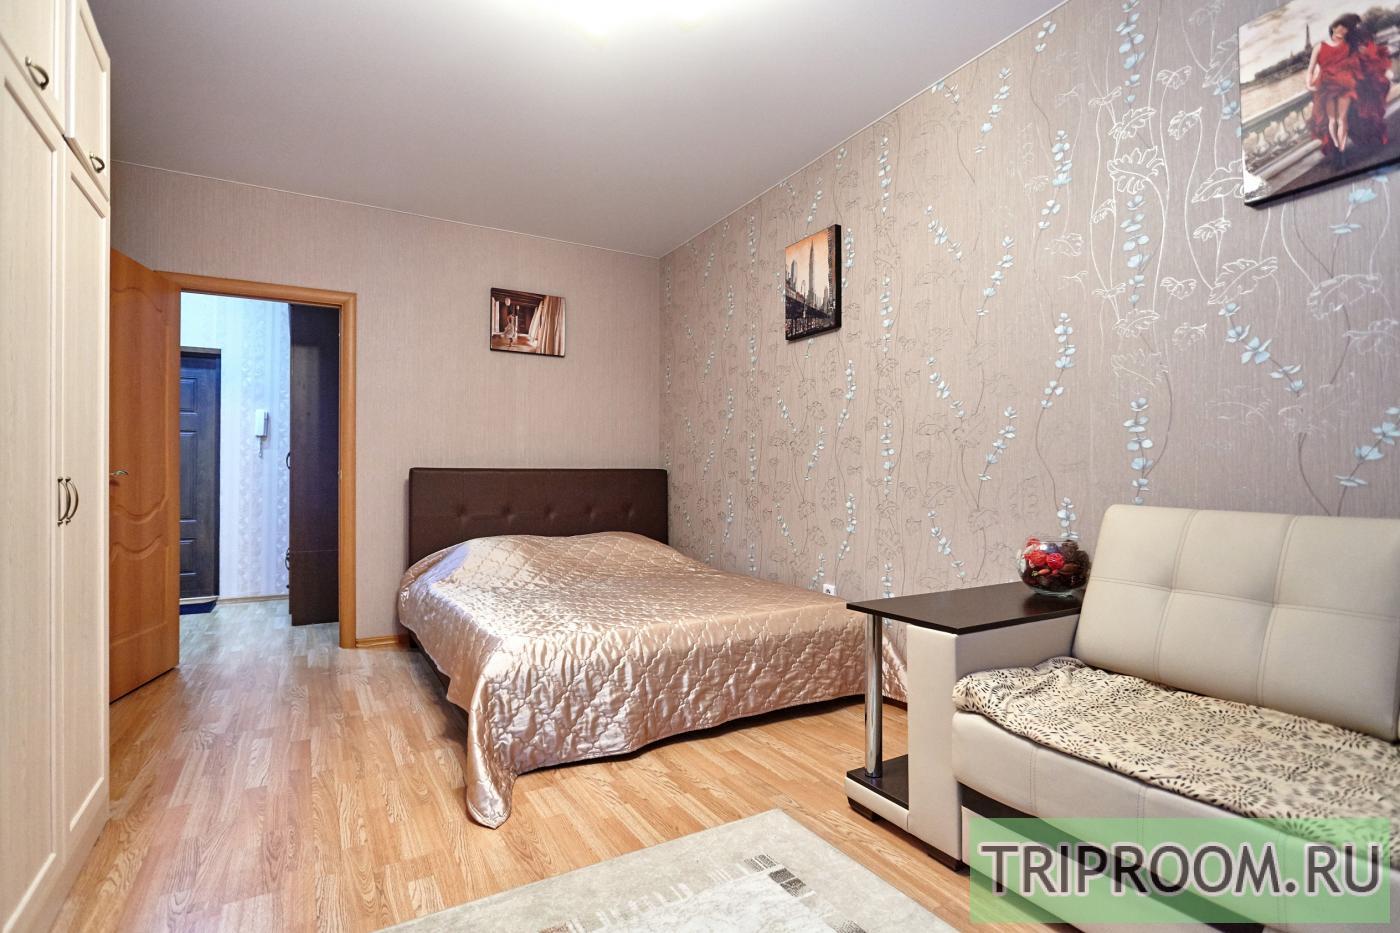 1-комнатная квартира посуточно (вариант № 6860), ул. Соколова улица, фото № 4